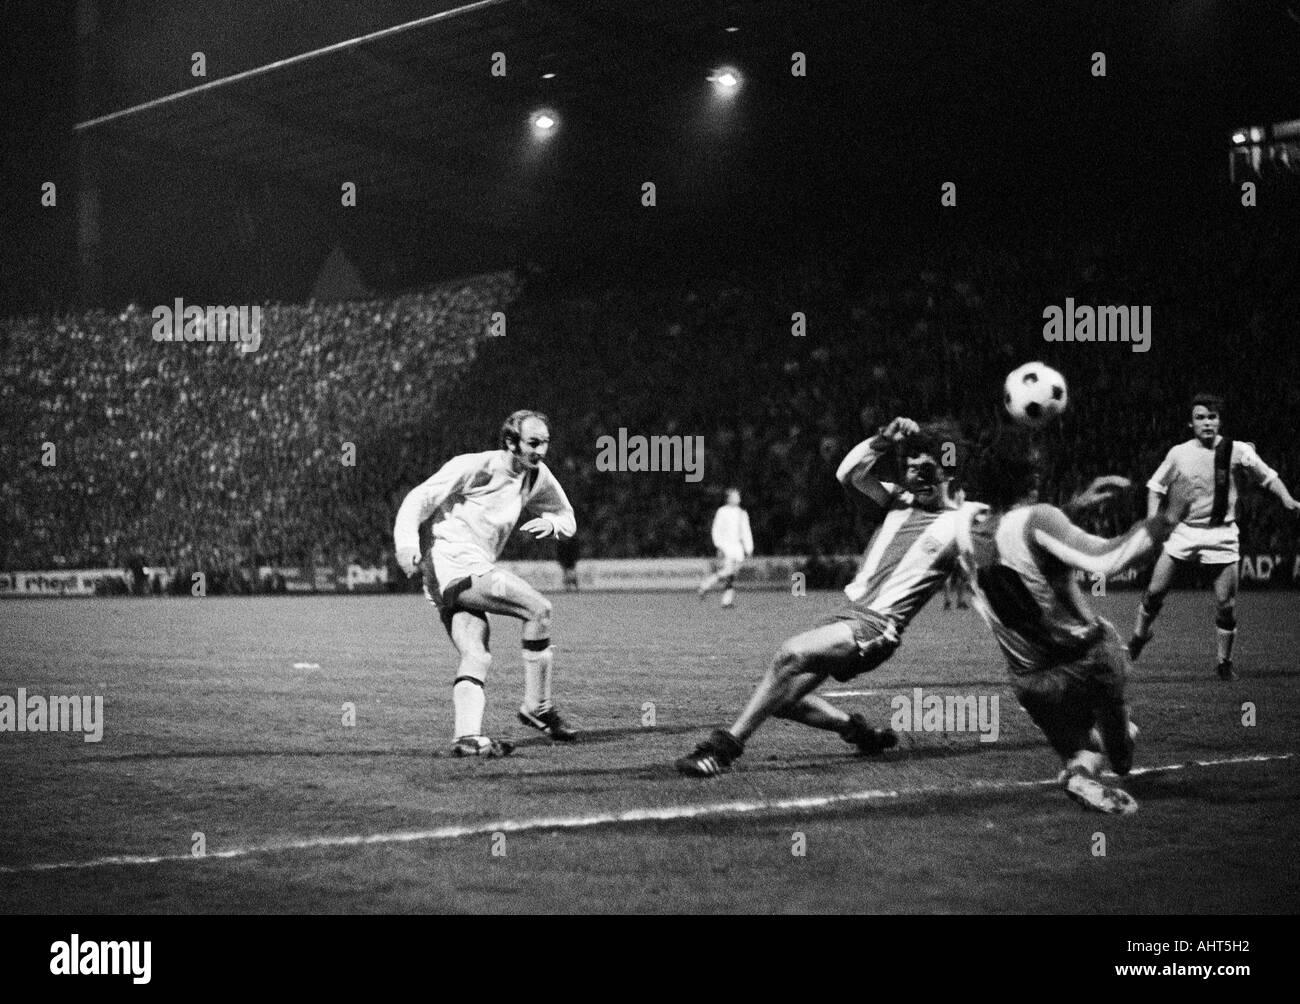 football, Bundesliga, 1970/1971, Borussia Moenchengladbach versus FC Bayern Munich 3:1, Boekelberg Stadium, scene of the match, f.l.t.r. Horst Koeppel (MG), two Munich players, Herbert Laumen (MG) - Stock Image